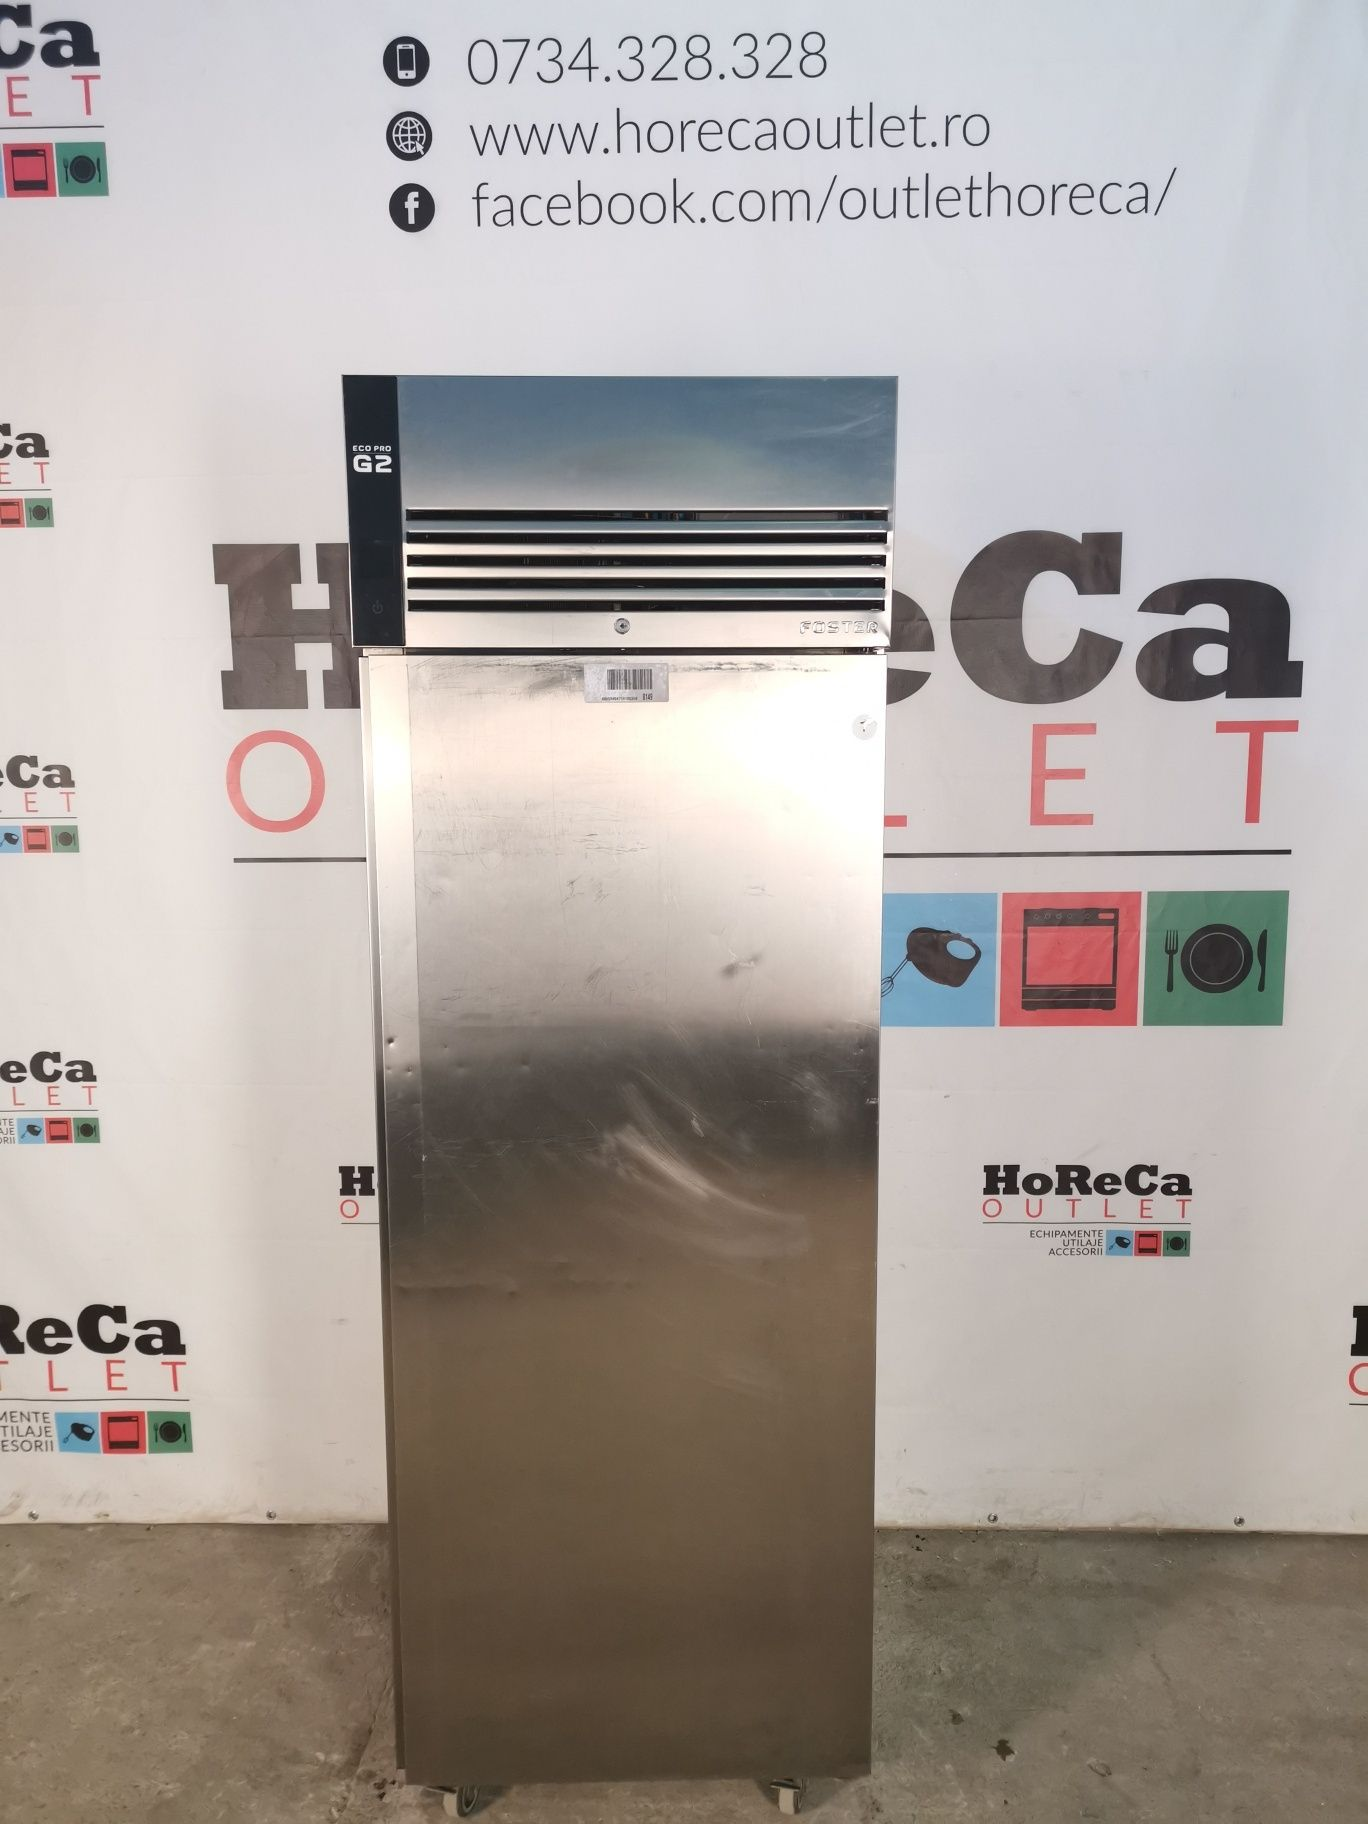 FOSTER Eco Pro G2 - Dulap frigorific; Frigider profesional 700 litri